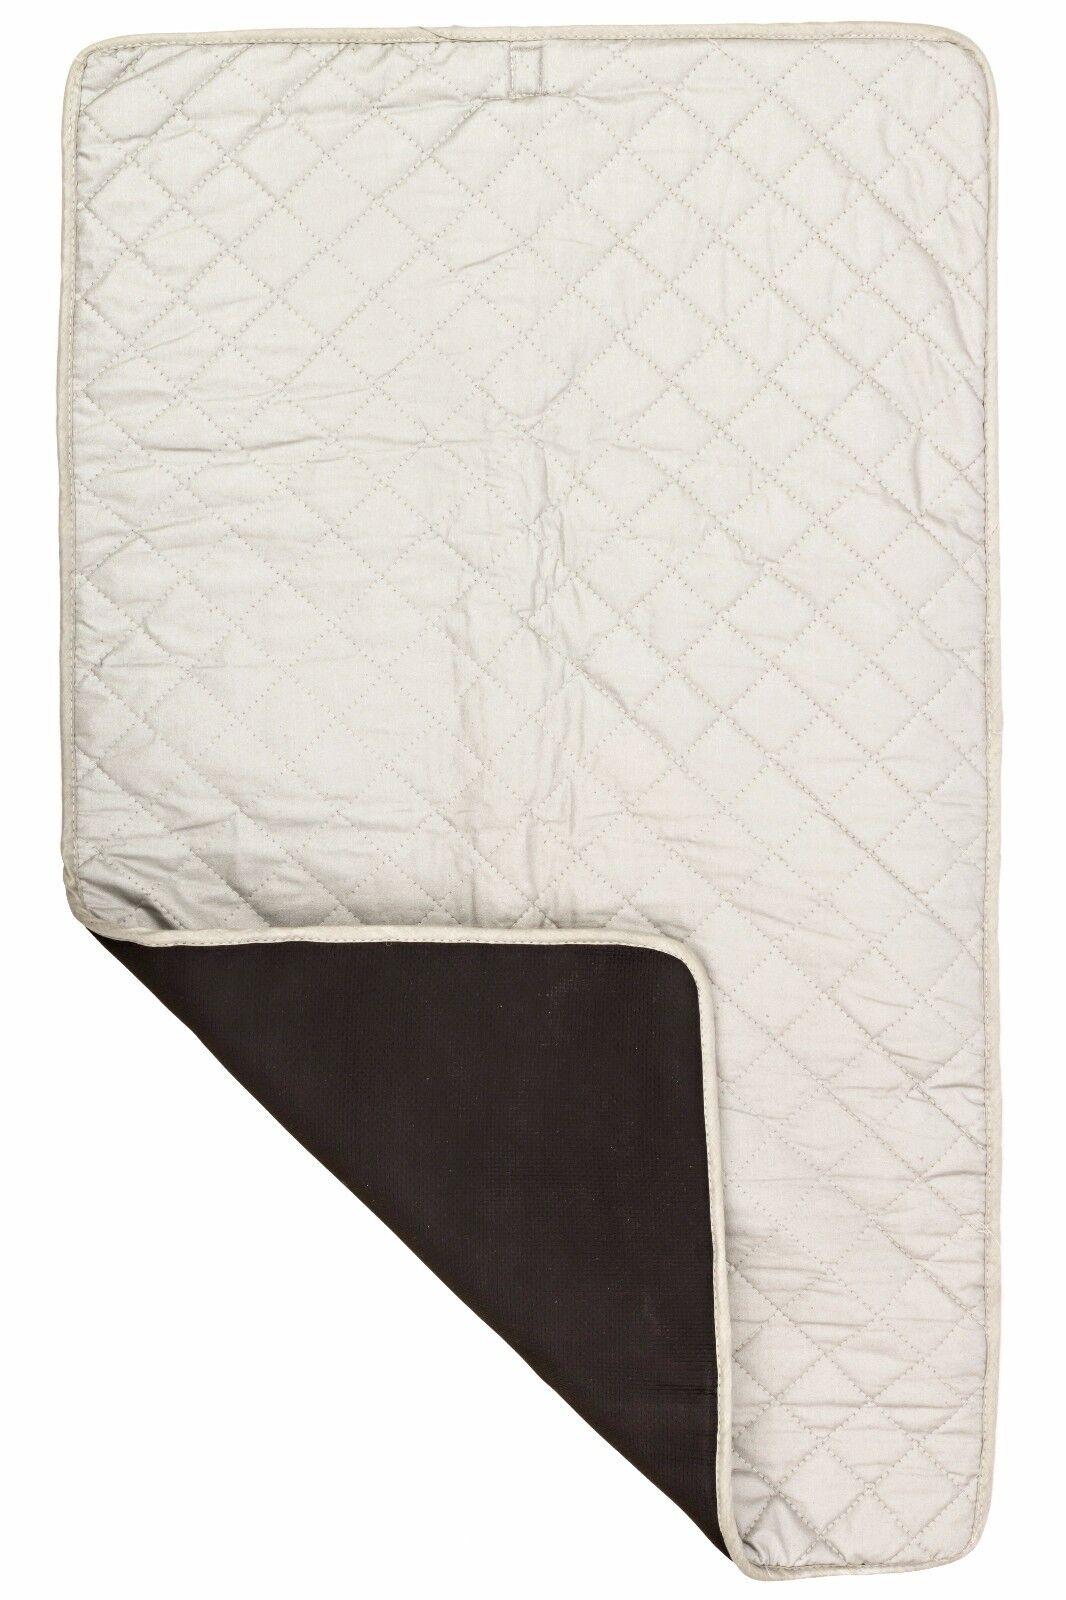 Heat/Moisture Repellent Non Skid Portable Ironing Blanket Ma